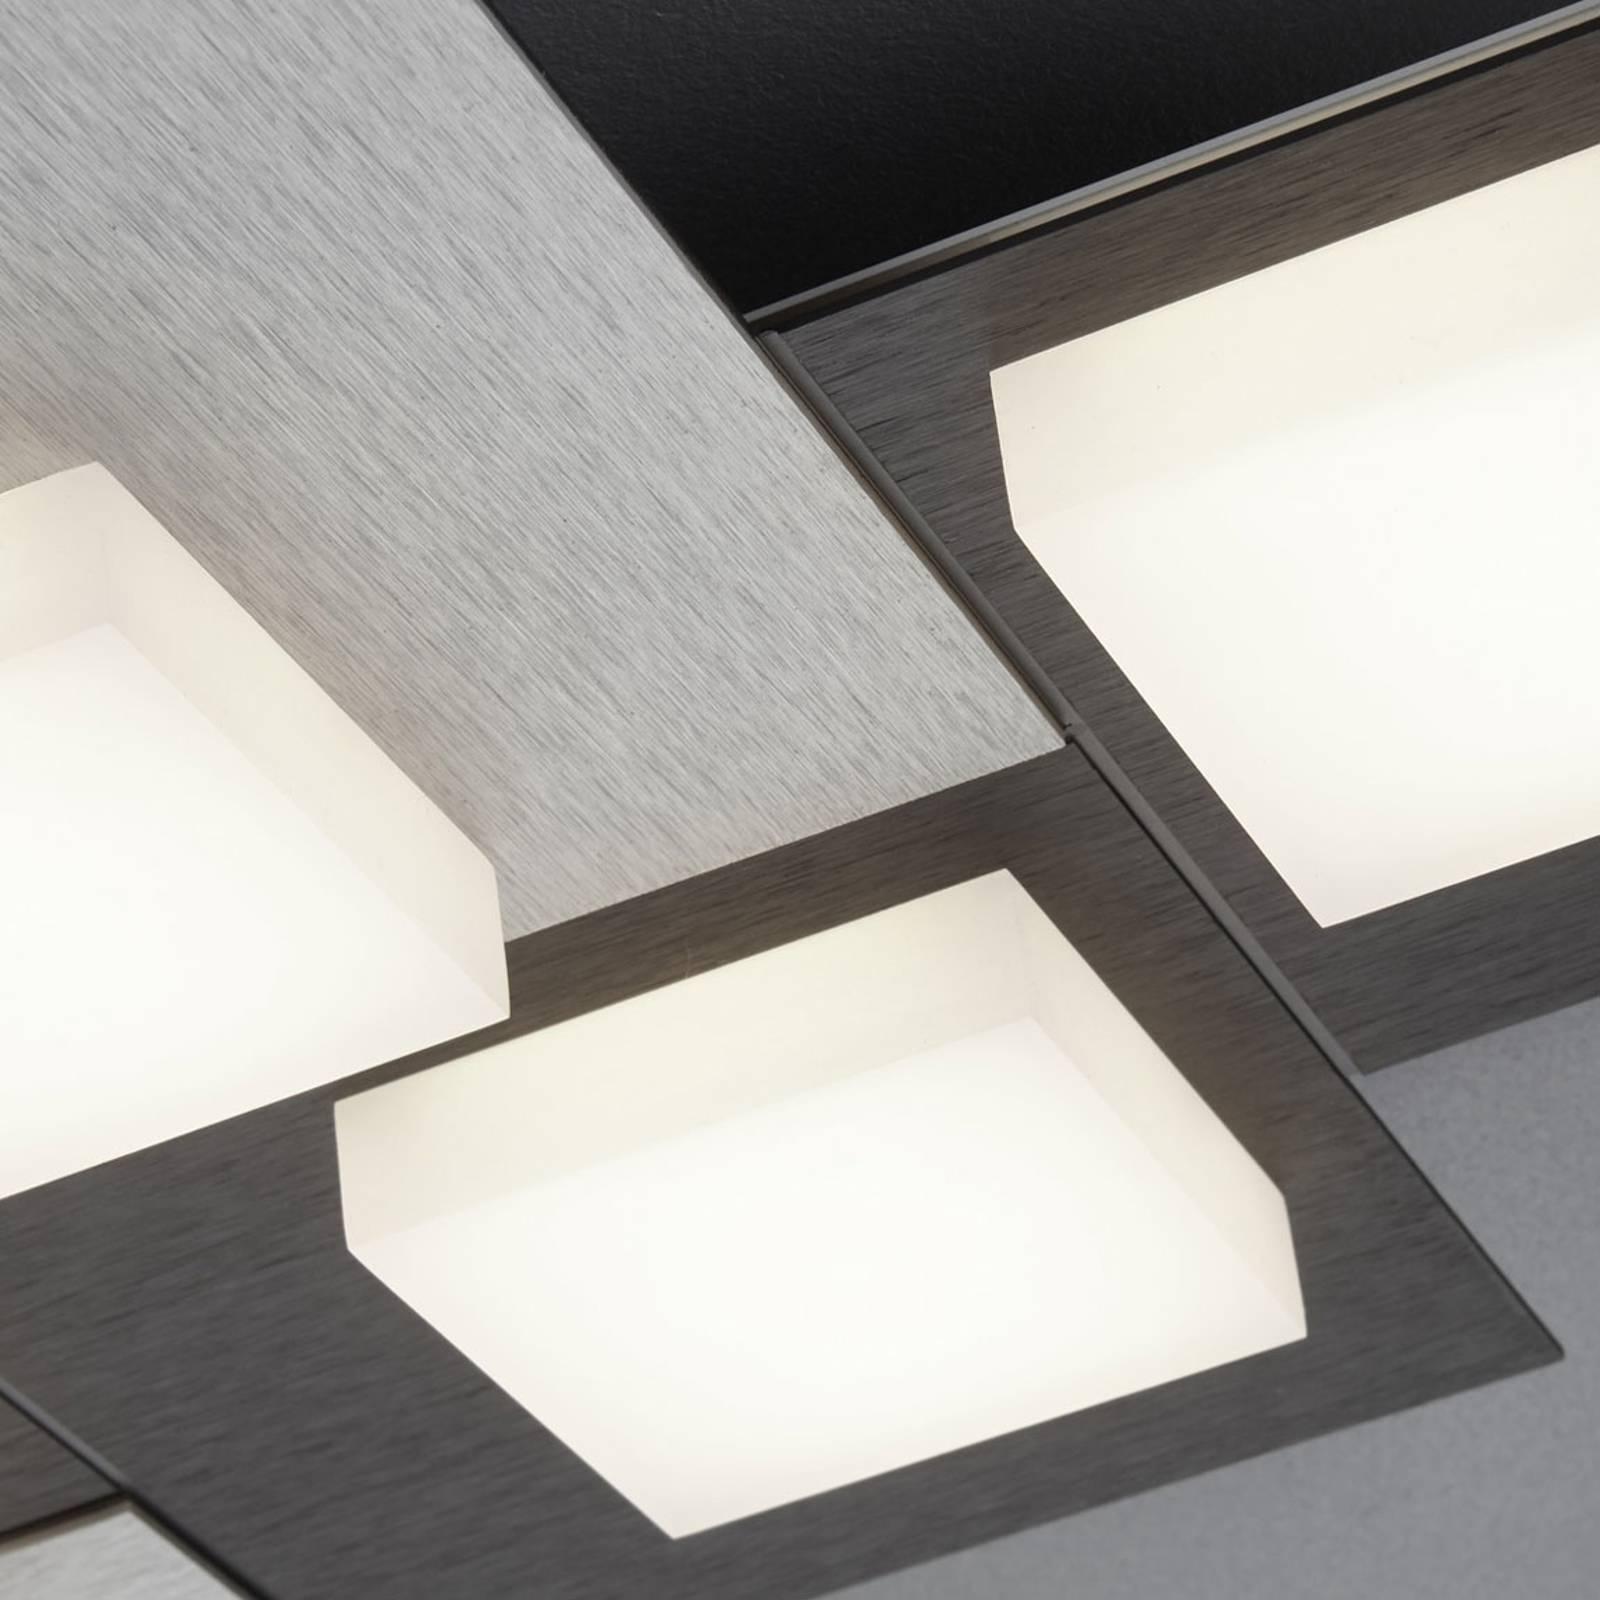 BANKAMP Cube plafondlamp 48W, antraciet